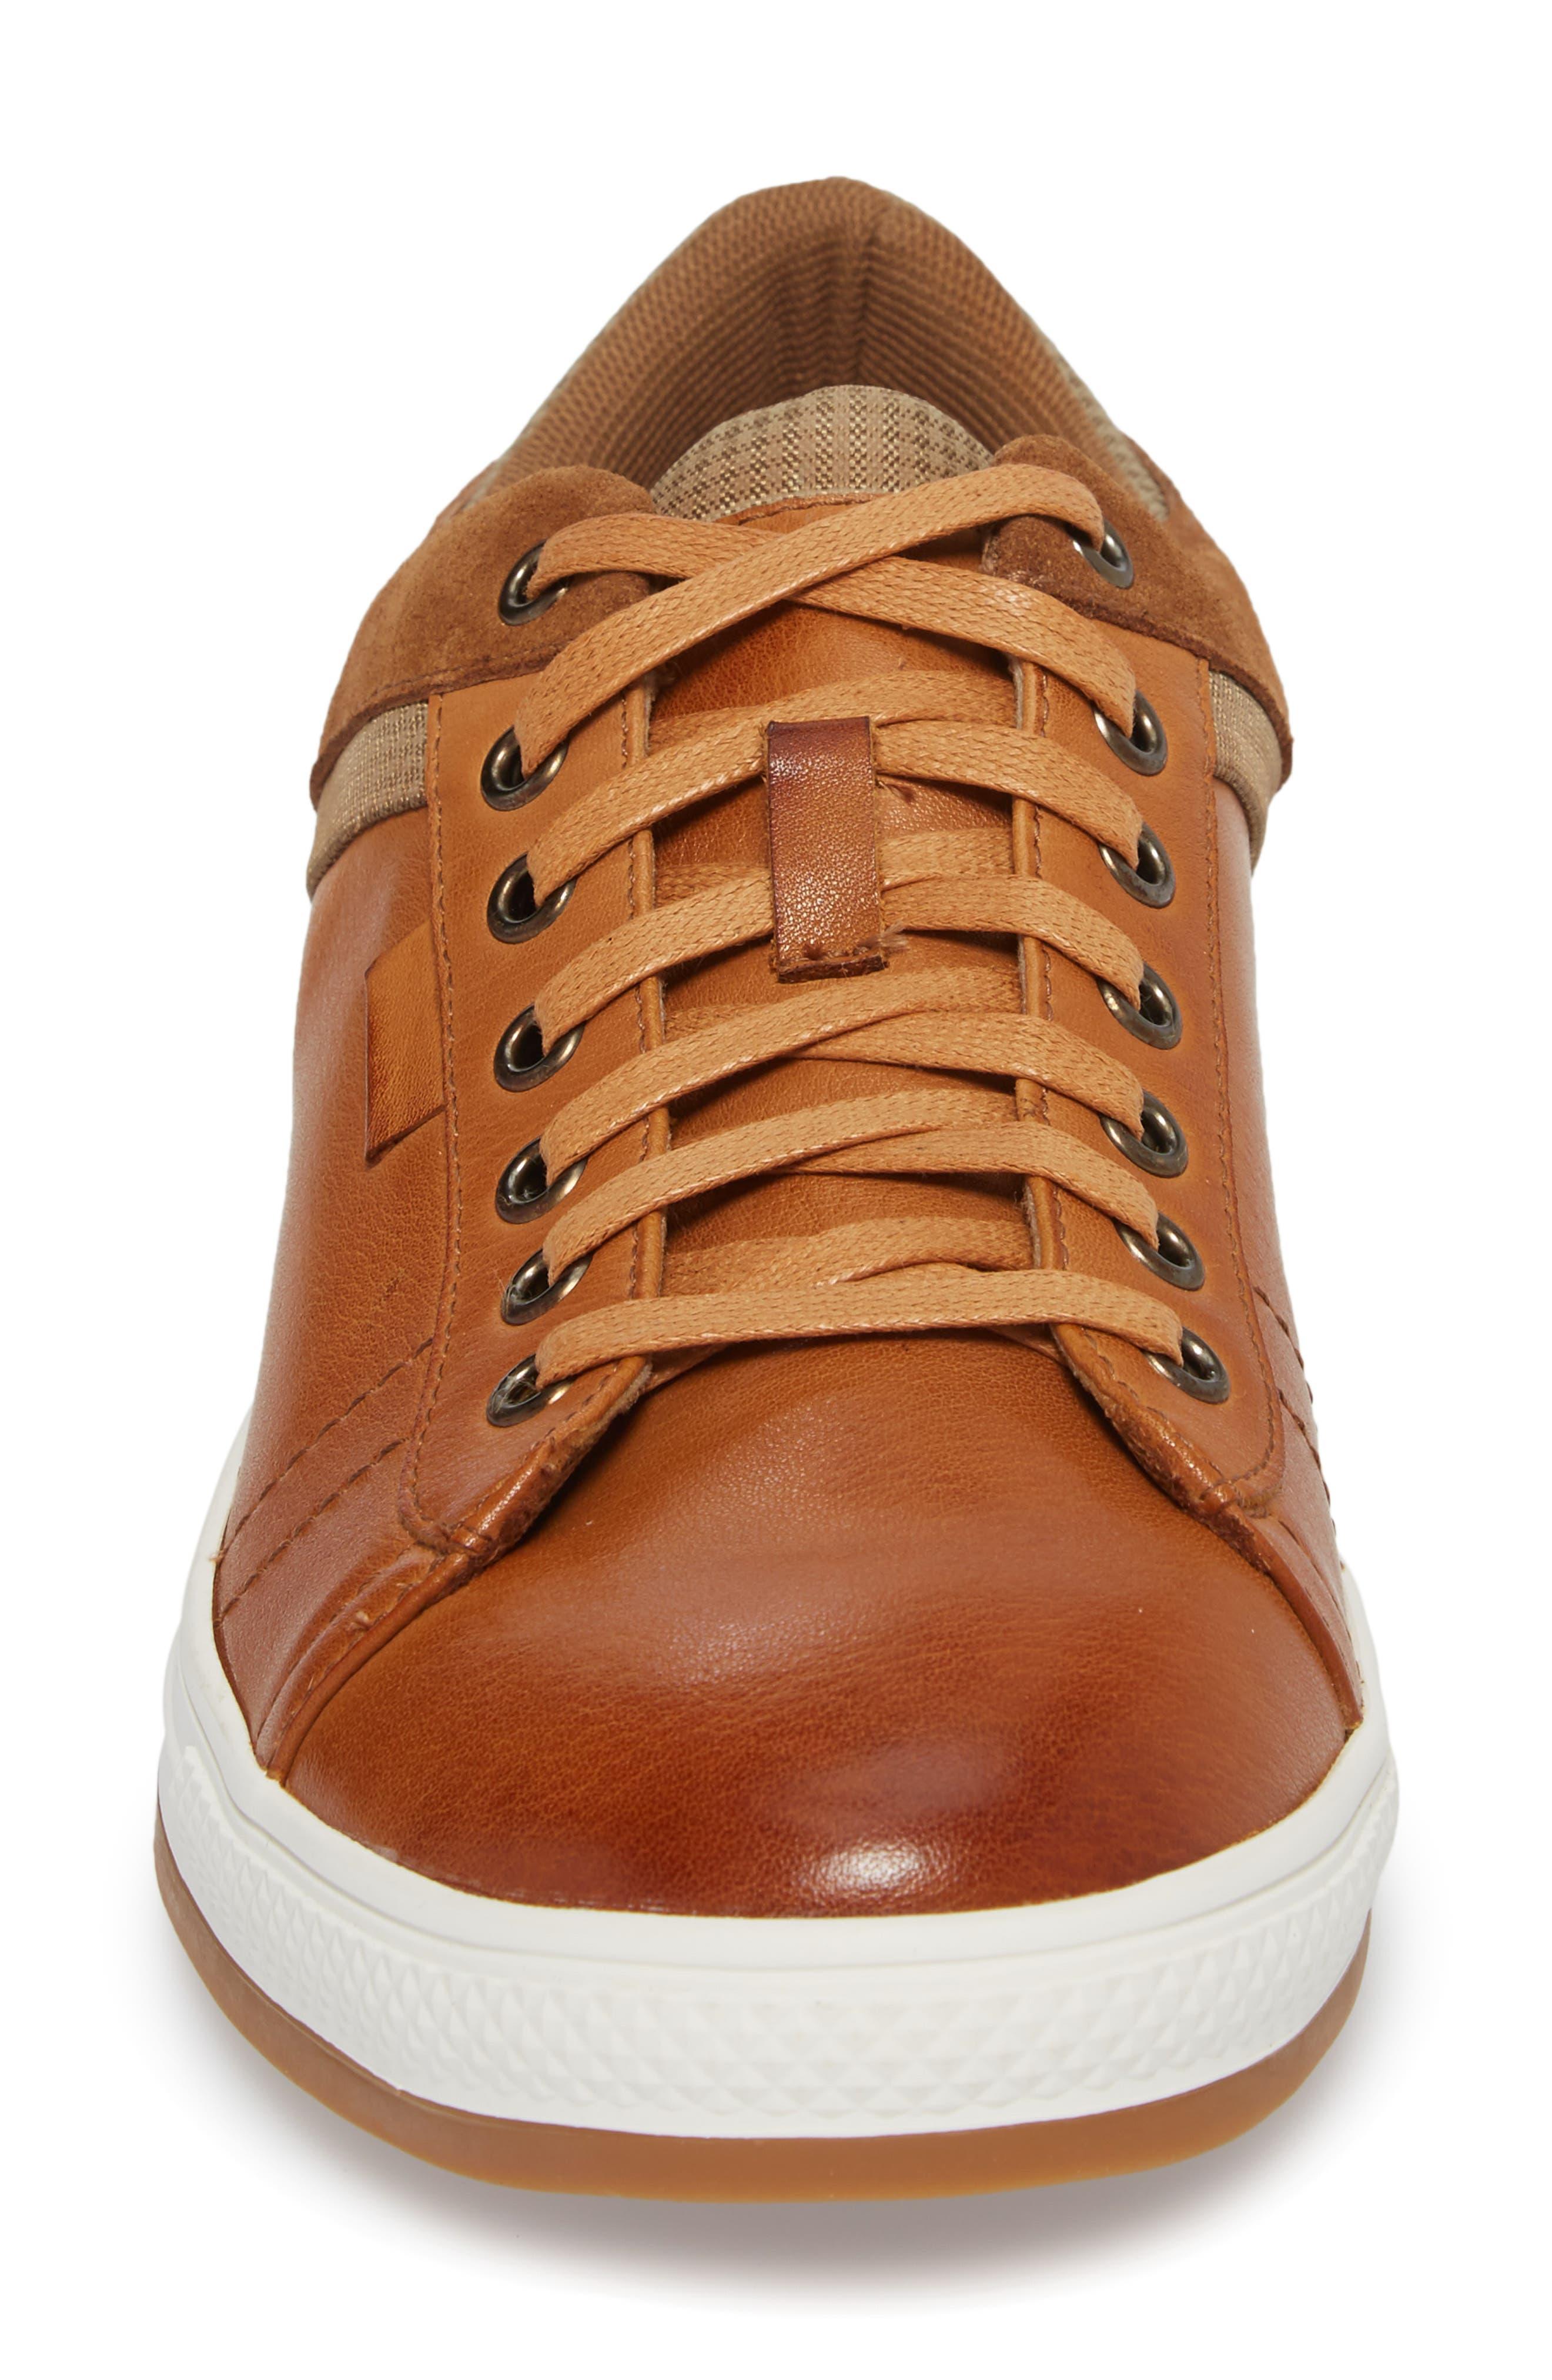 Ireton Low Top Sneaker,                             Alternate thumbnail 4, color,                             Cognac Leather/ Suede